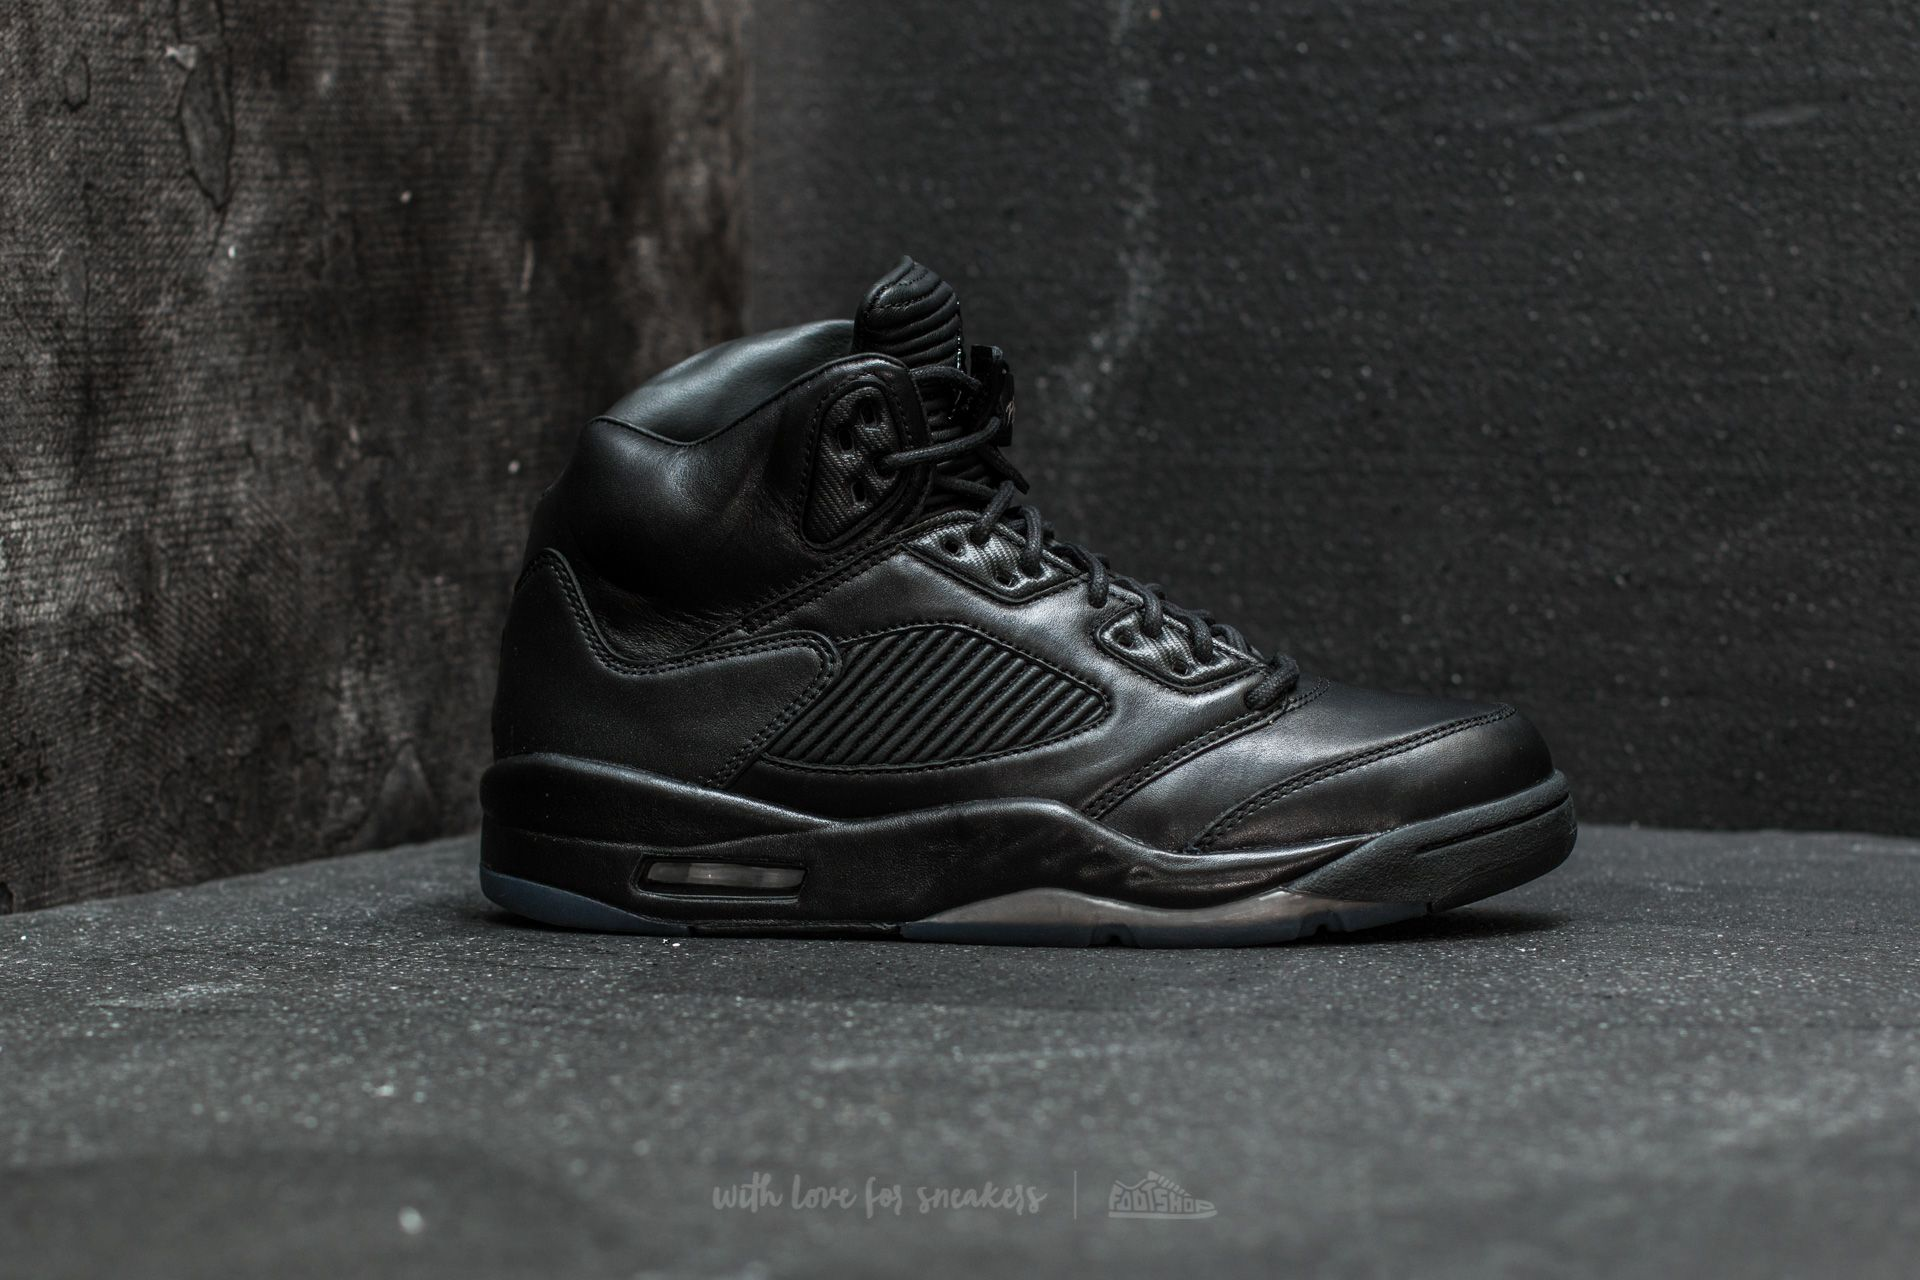 BlackFootshop Jordan 5 Air Premium Retro 0vn8yNOmw